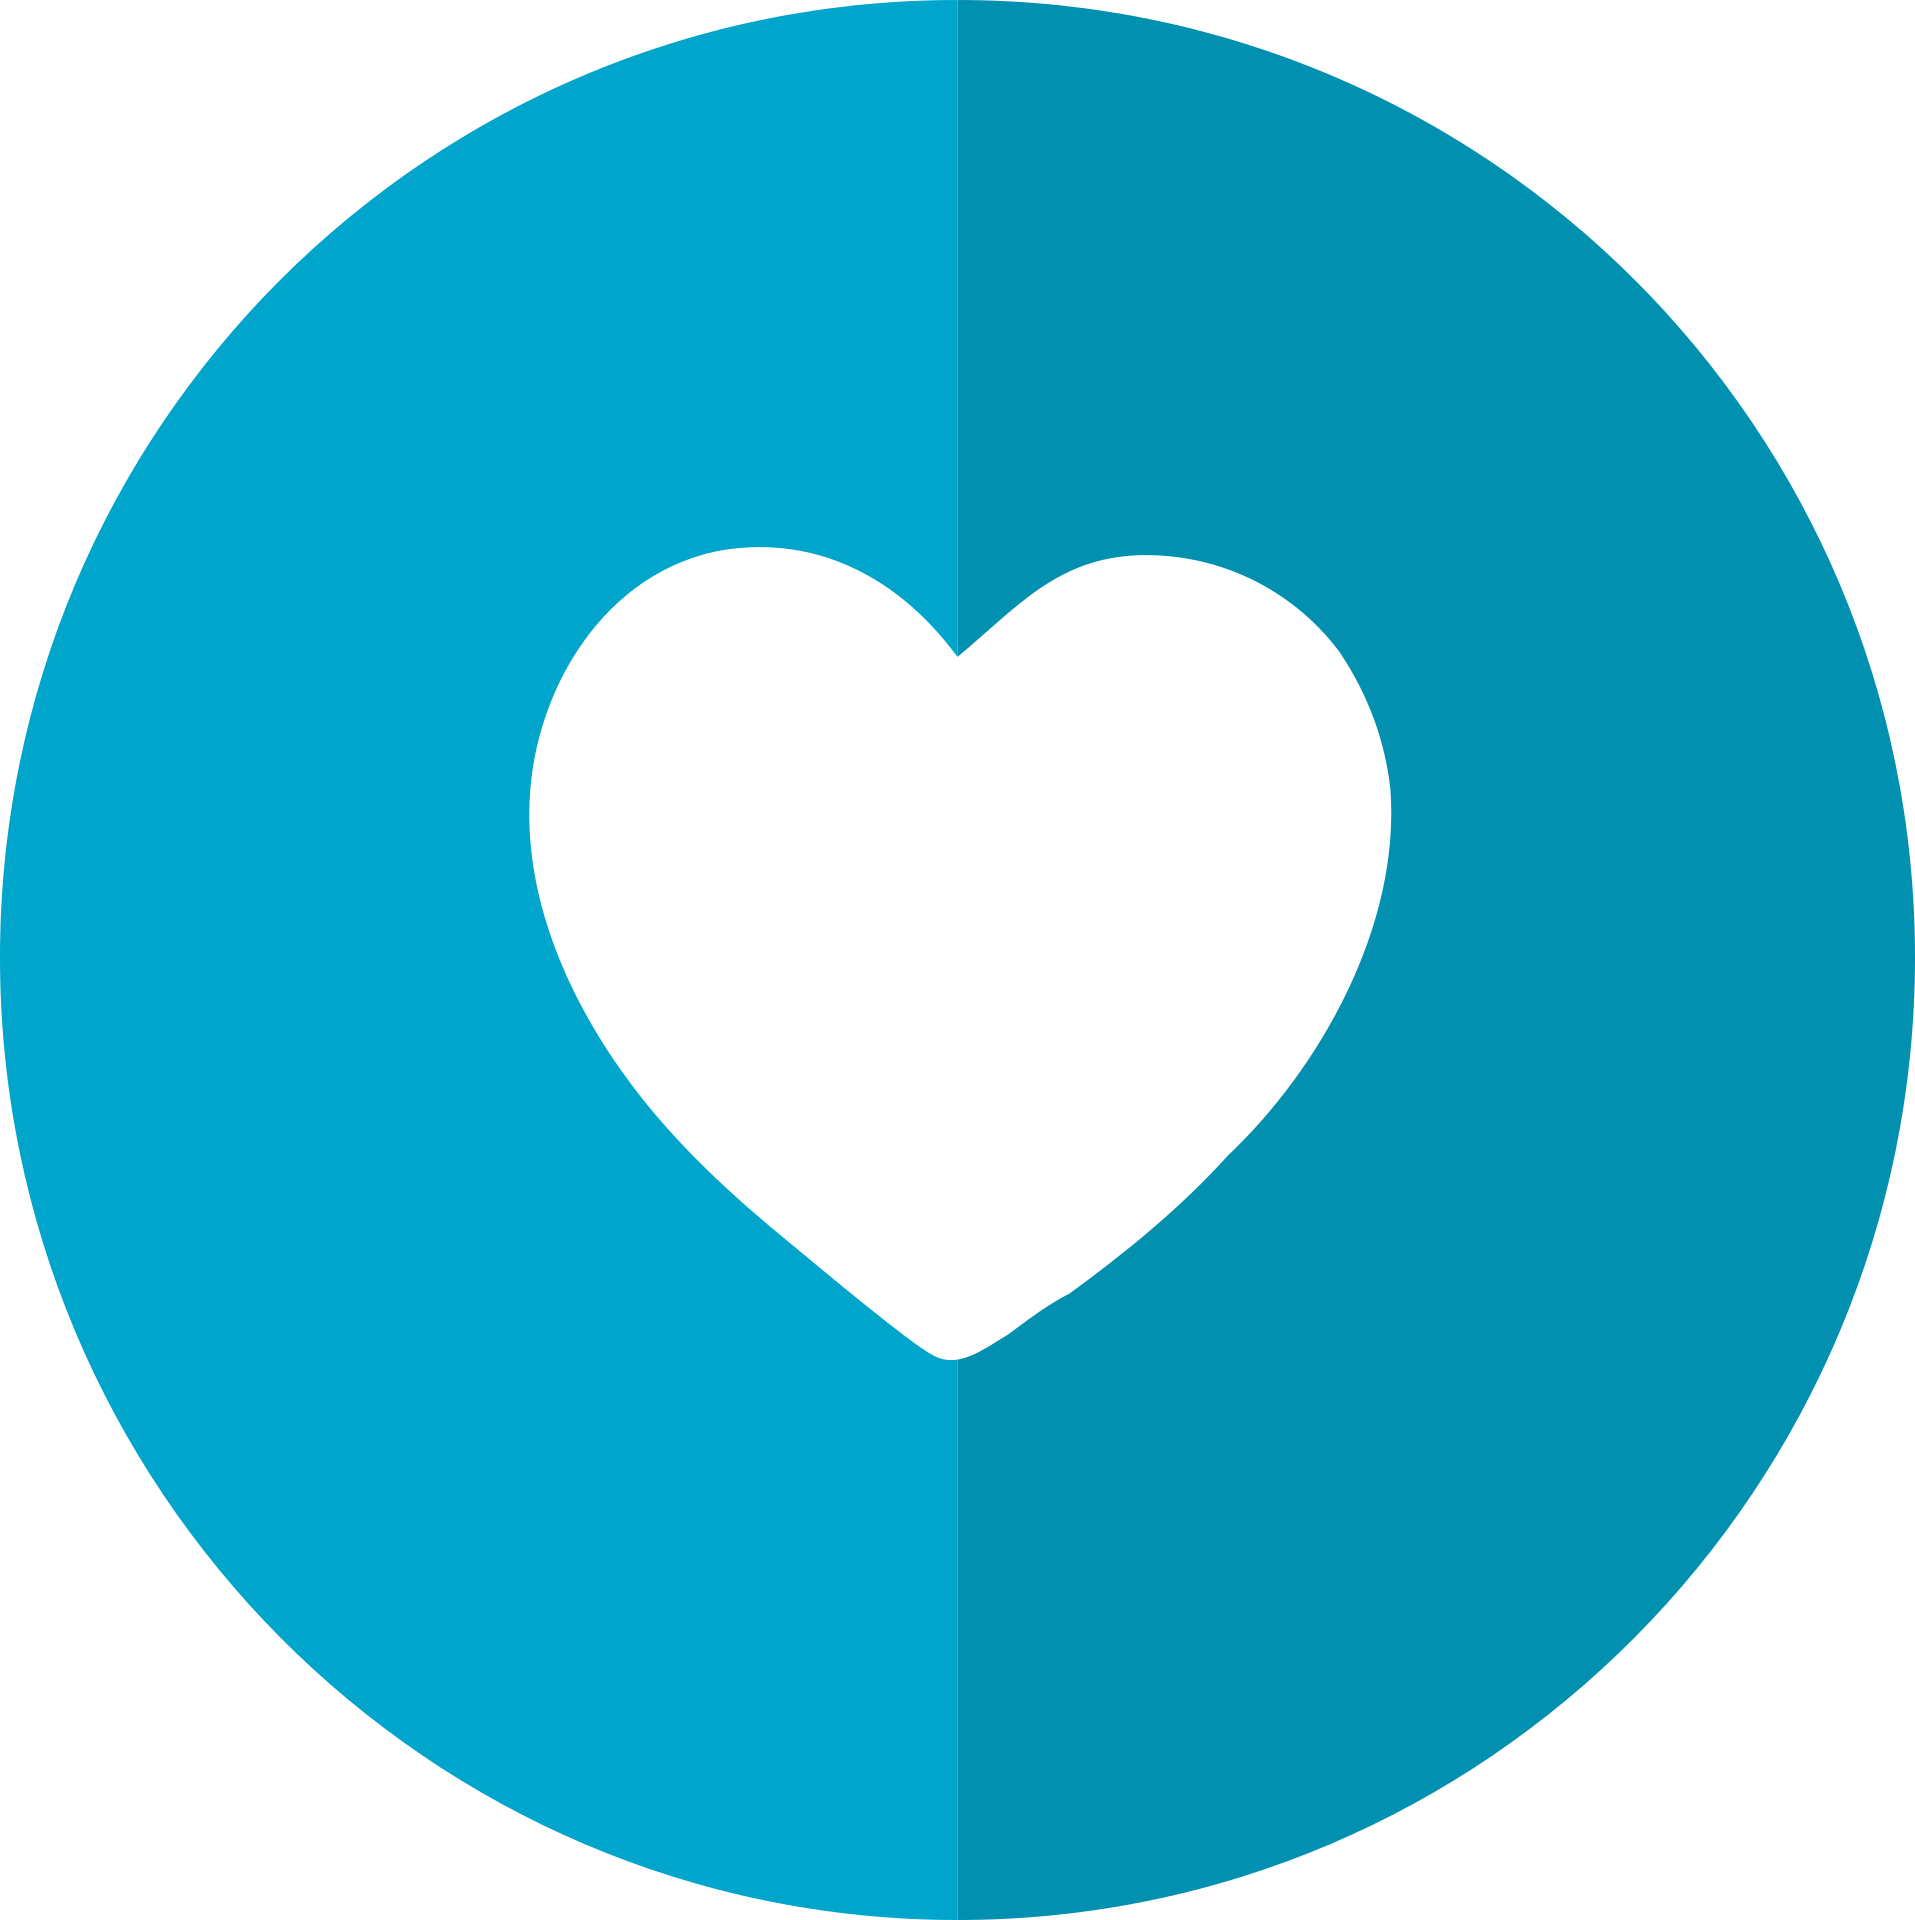 Kreative Kommunikation Agency Landing Page Raidboxes heart icon 2316451